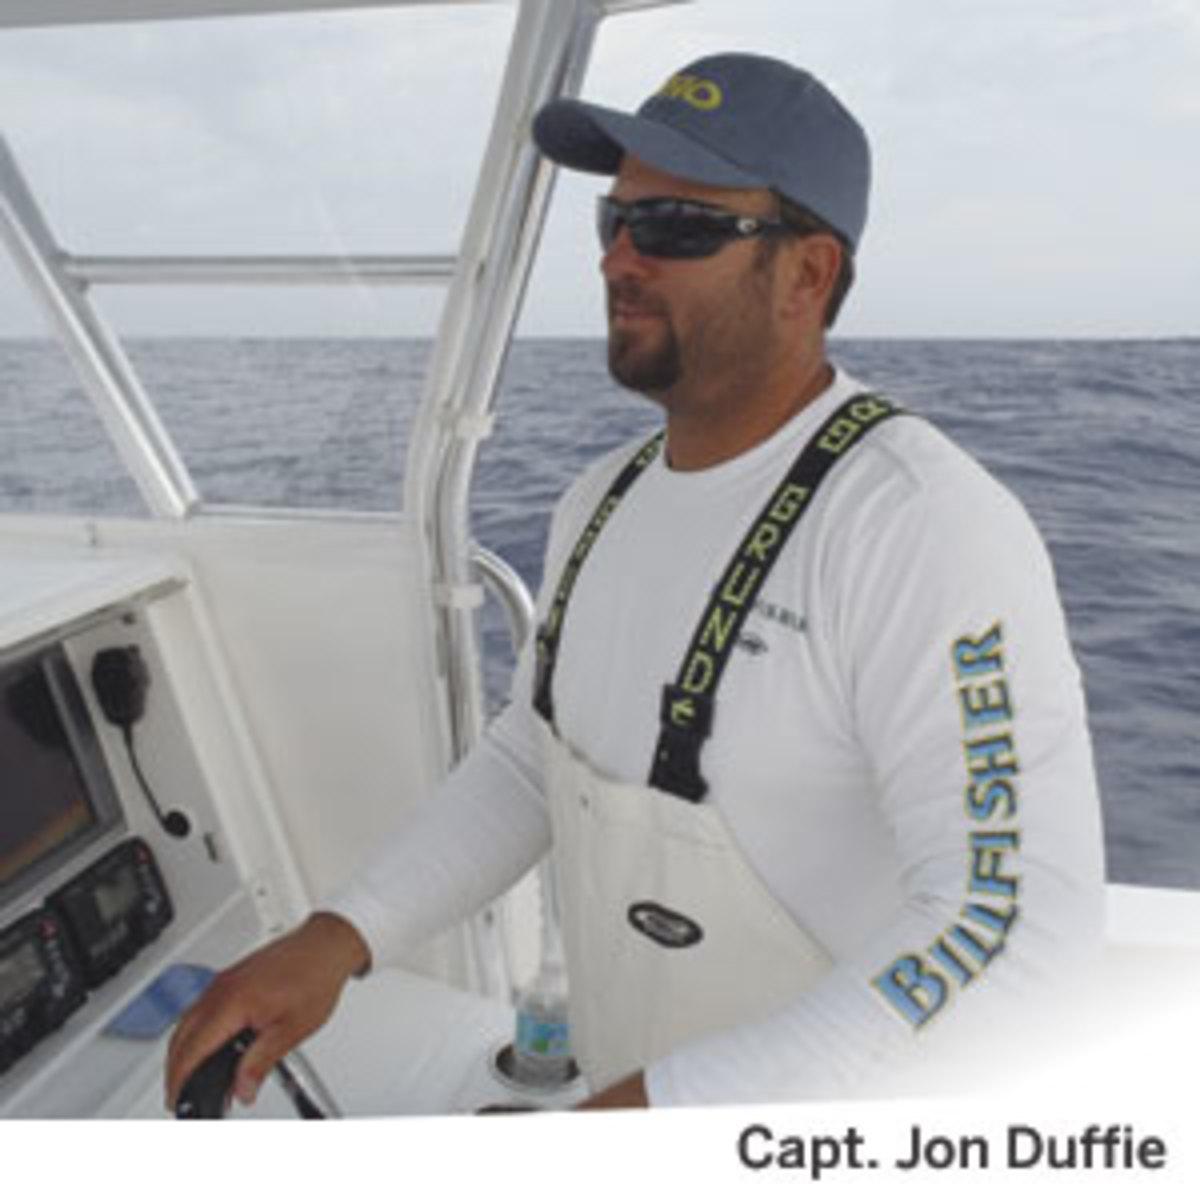 Capt. Jon Duffie